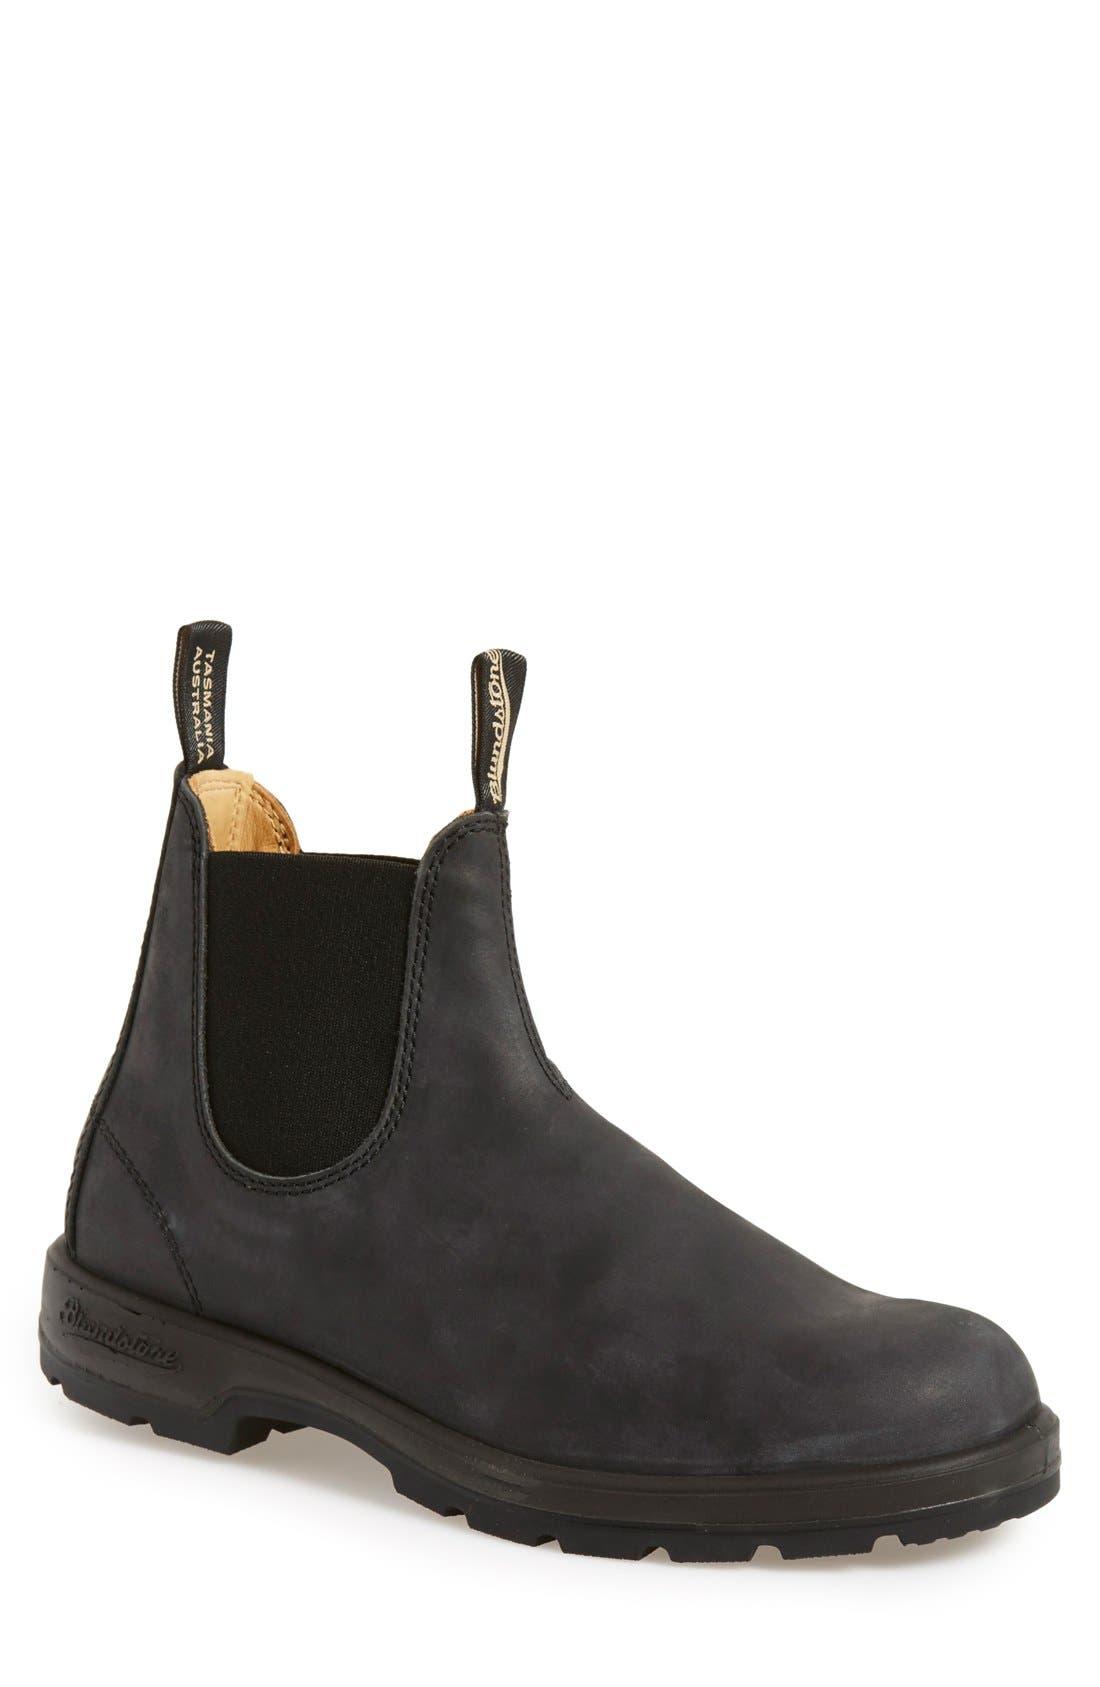 Blundstone Footwear Chelsea Boot- Black